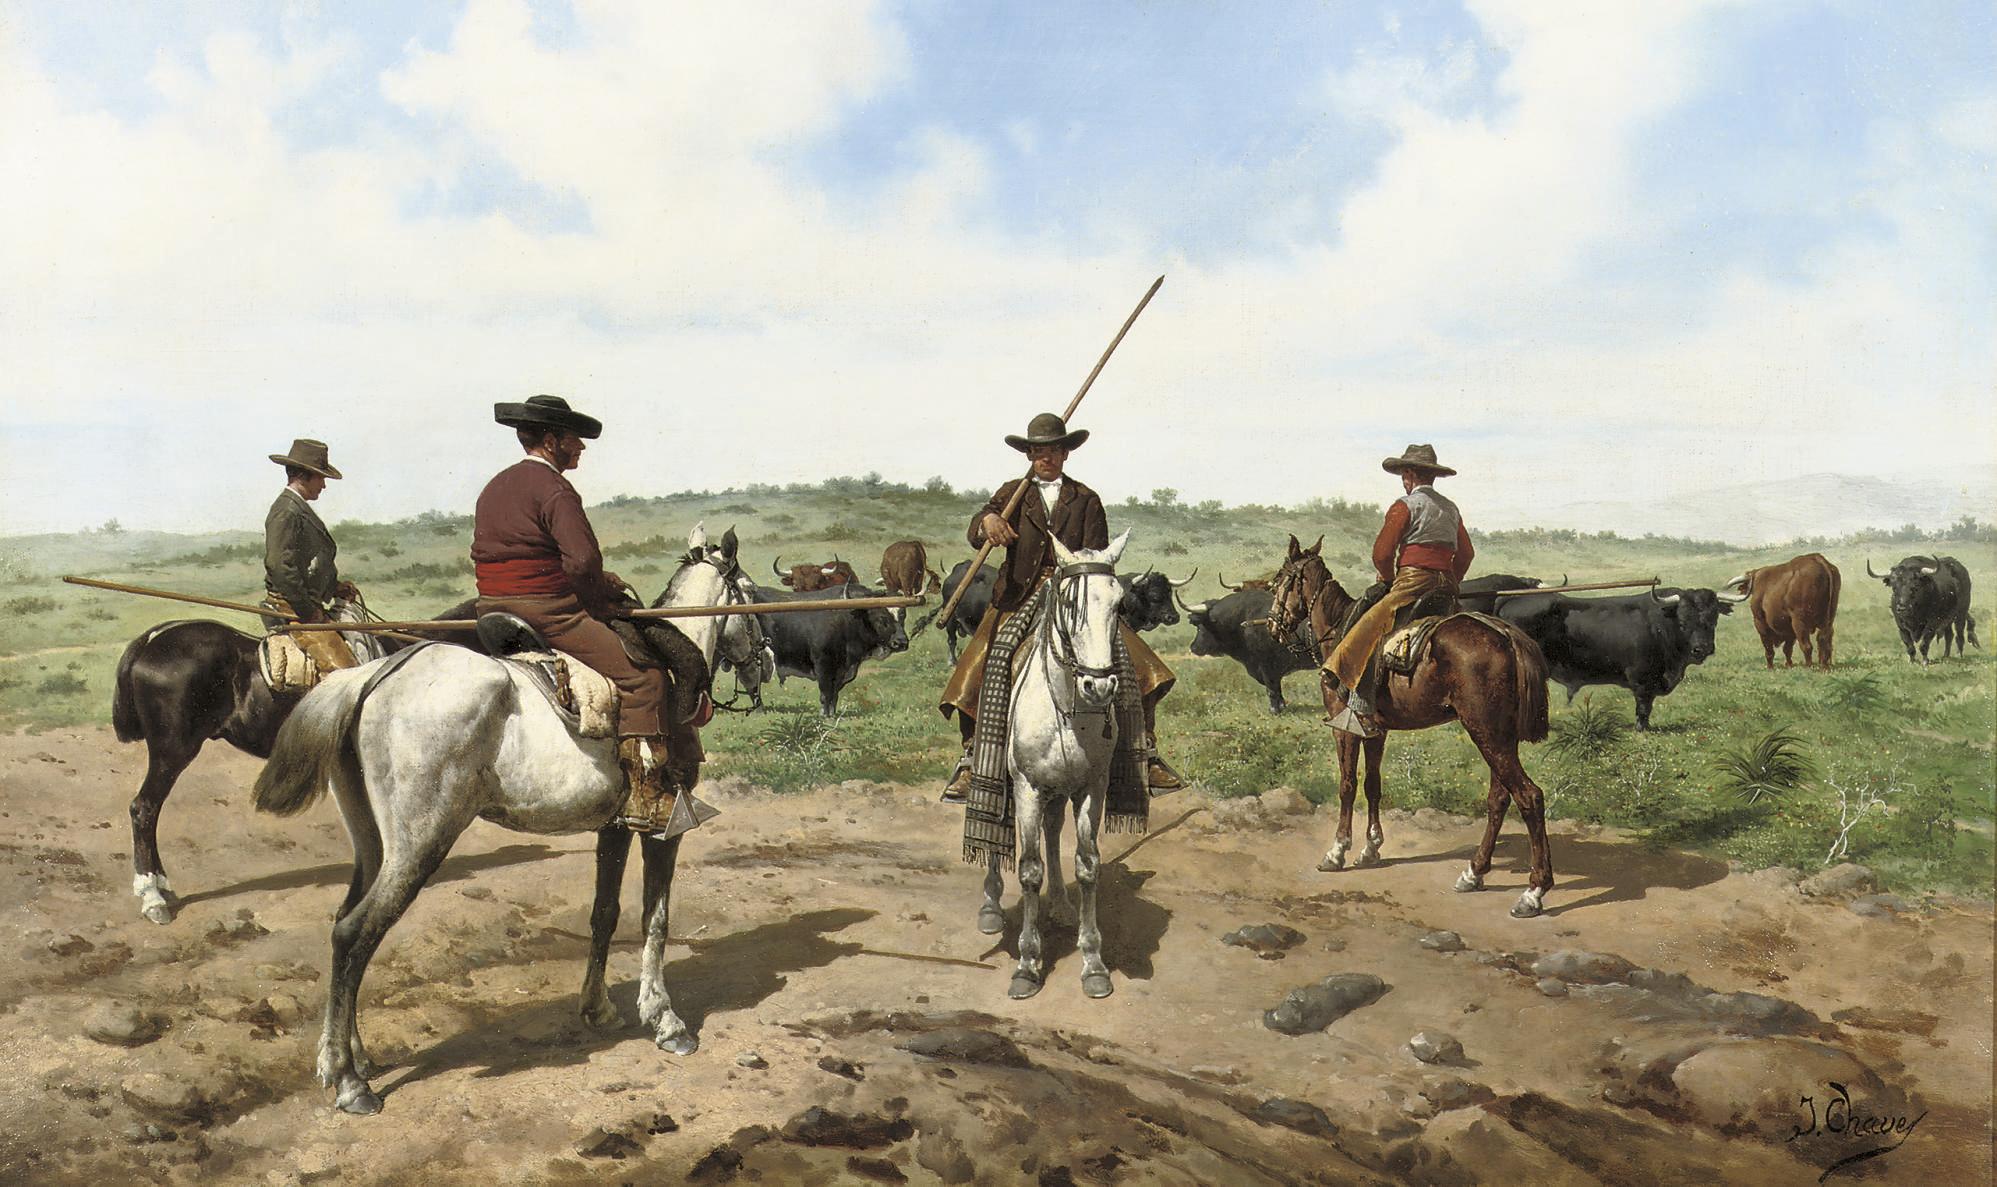 Garrochistas: herding the cattle